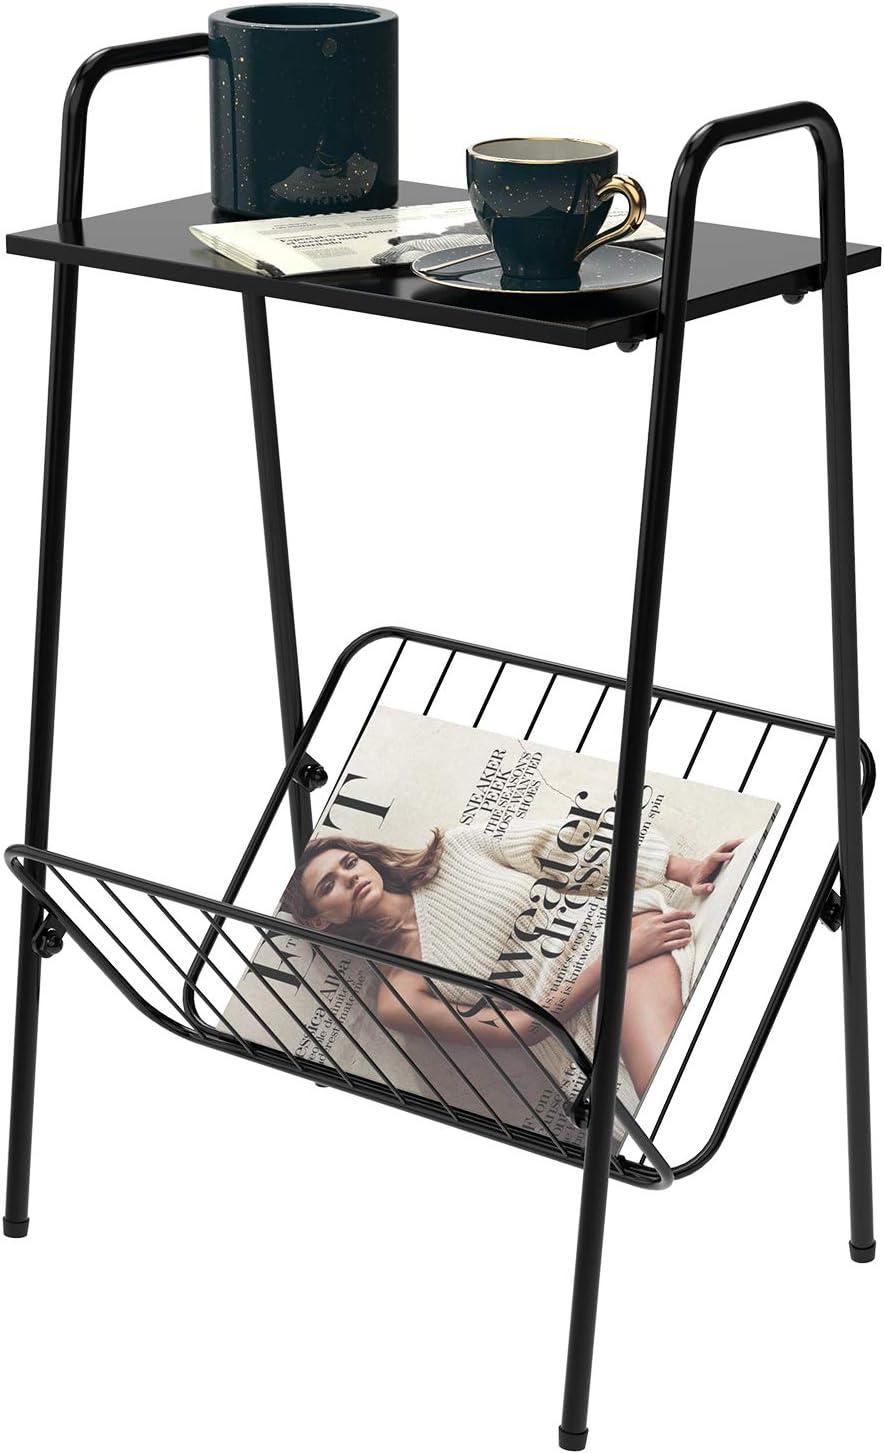 End Tables for Living Room Tables Side Tables Bedroom Nightstand Corner Shelves,with Magazine Rack,Metal Black